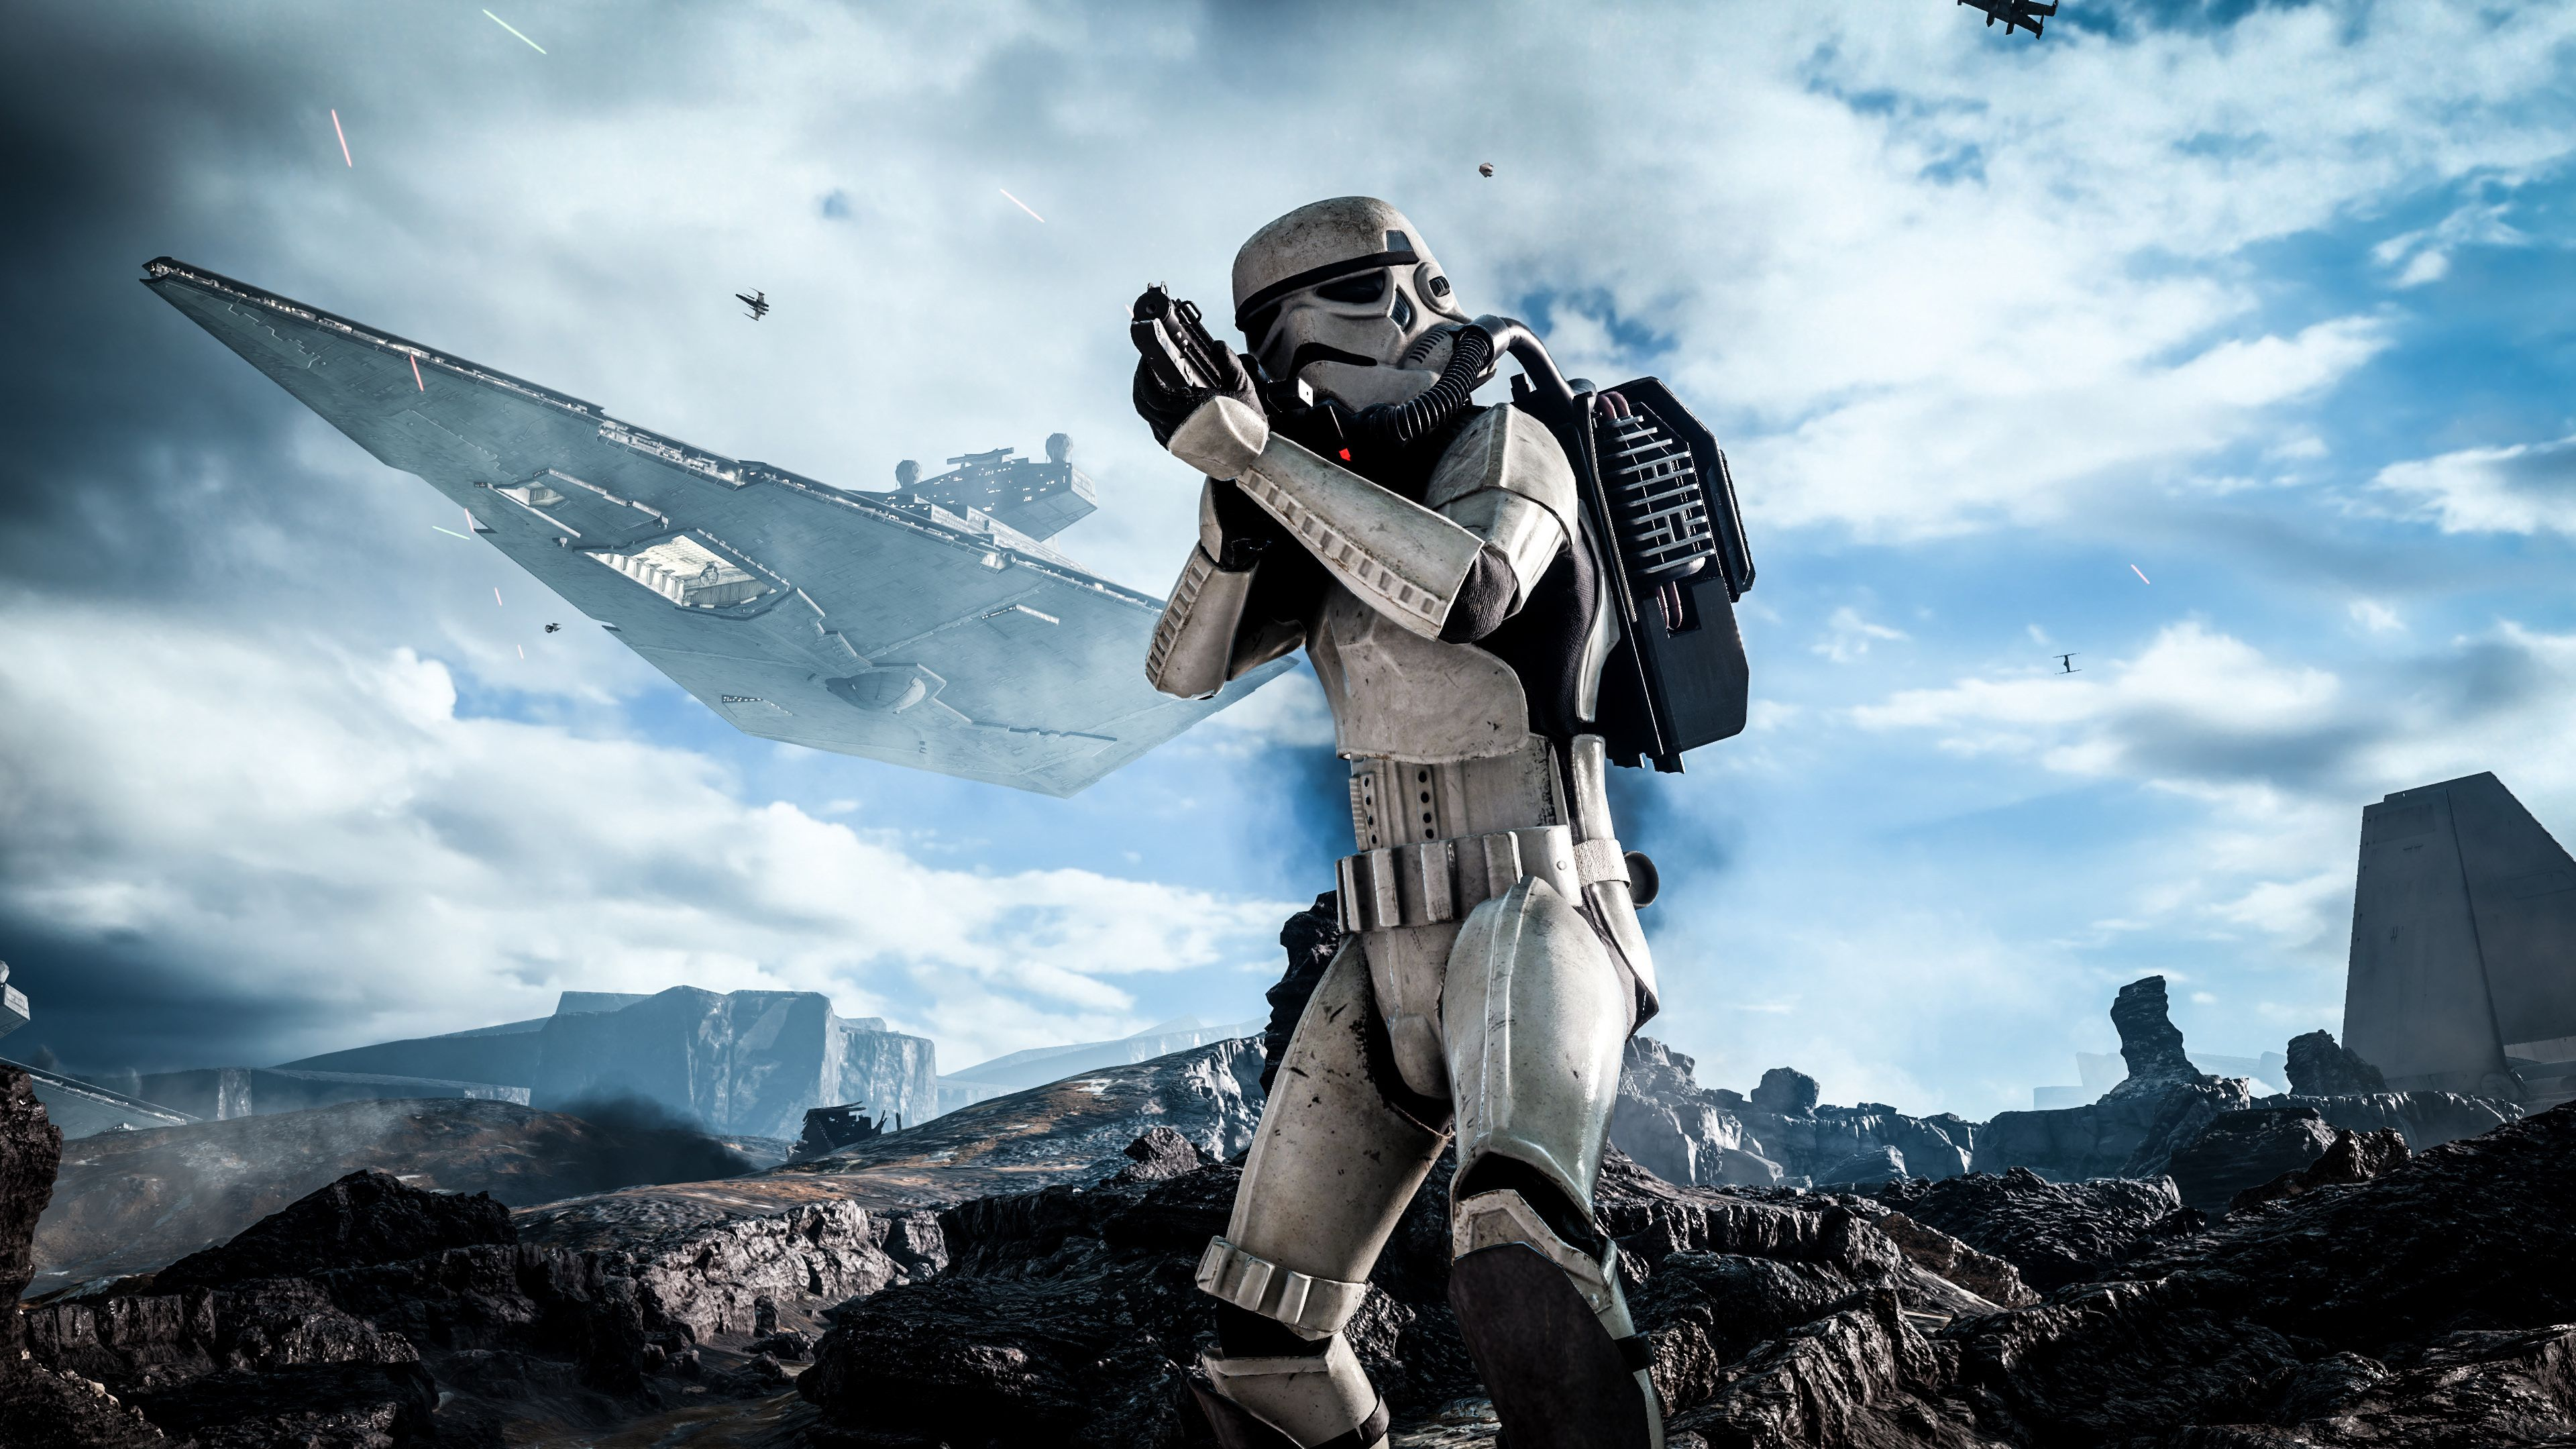 Top 50 Mobile Laptop And Desktop Wallpaper Hd High Resolution Star Wars Wallpaper Star Wars Movie Gaming Wallpapers